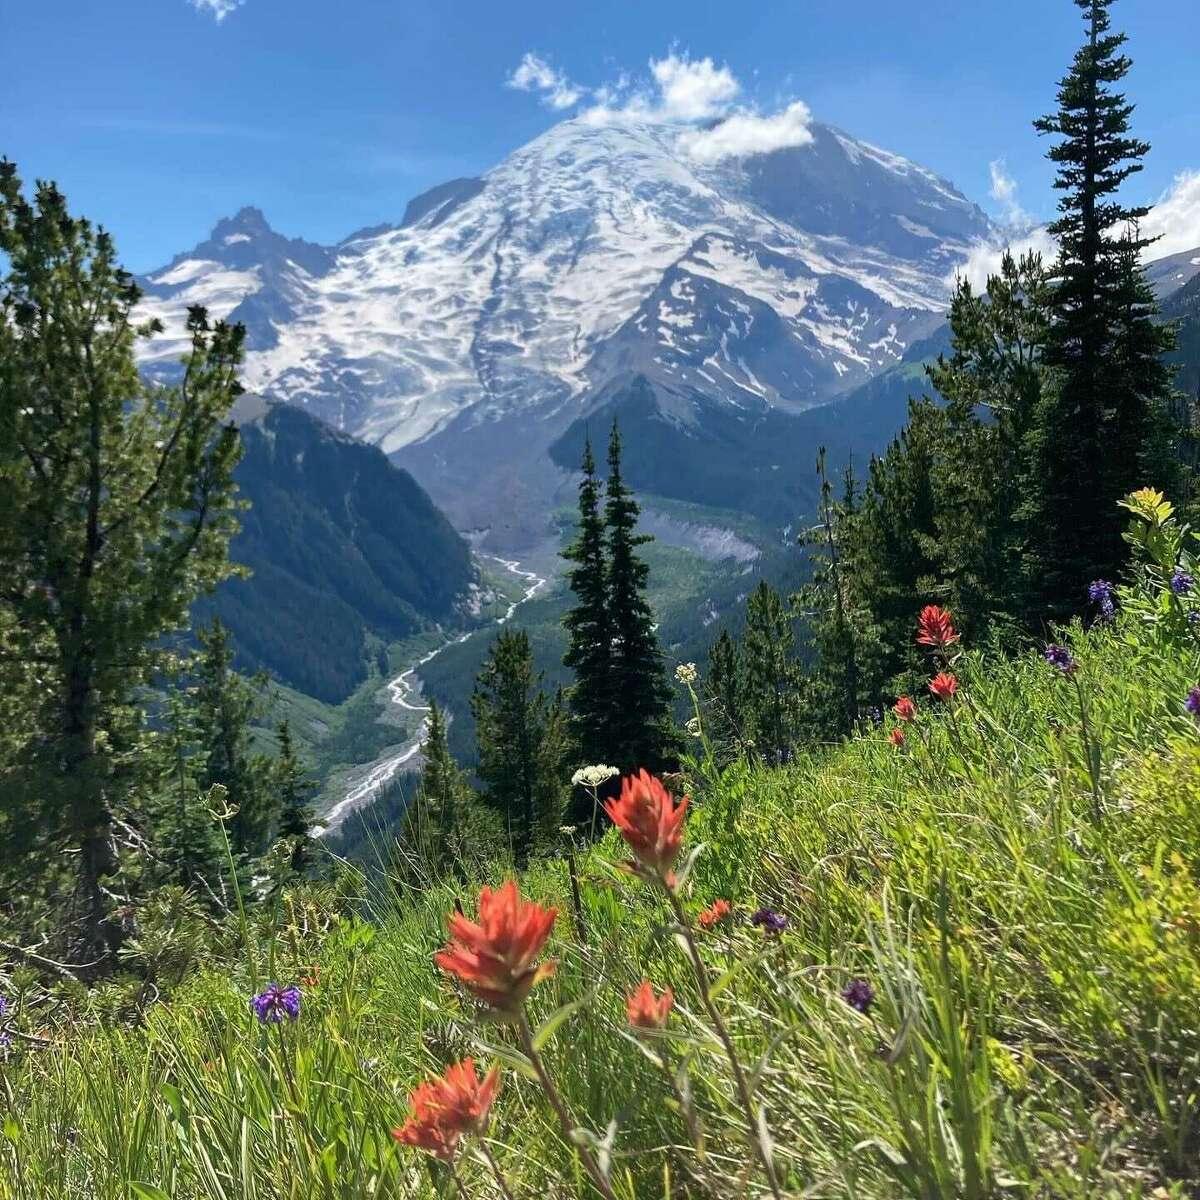 Mount Rainier - July 2021